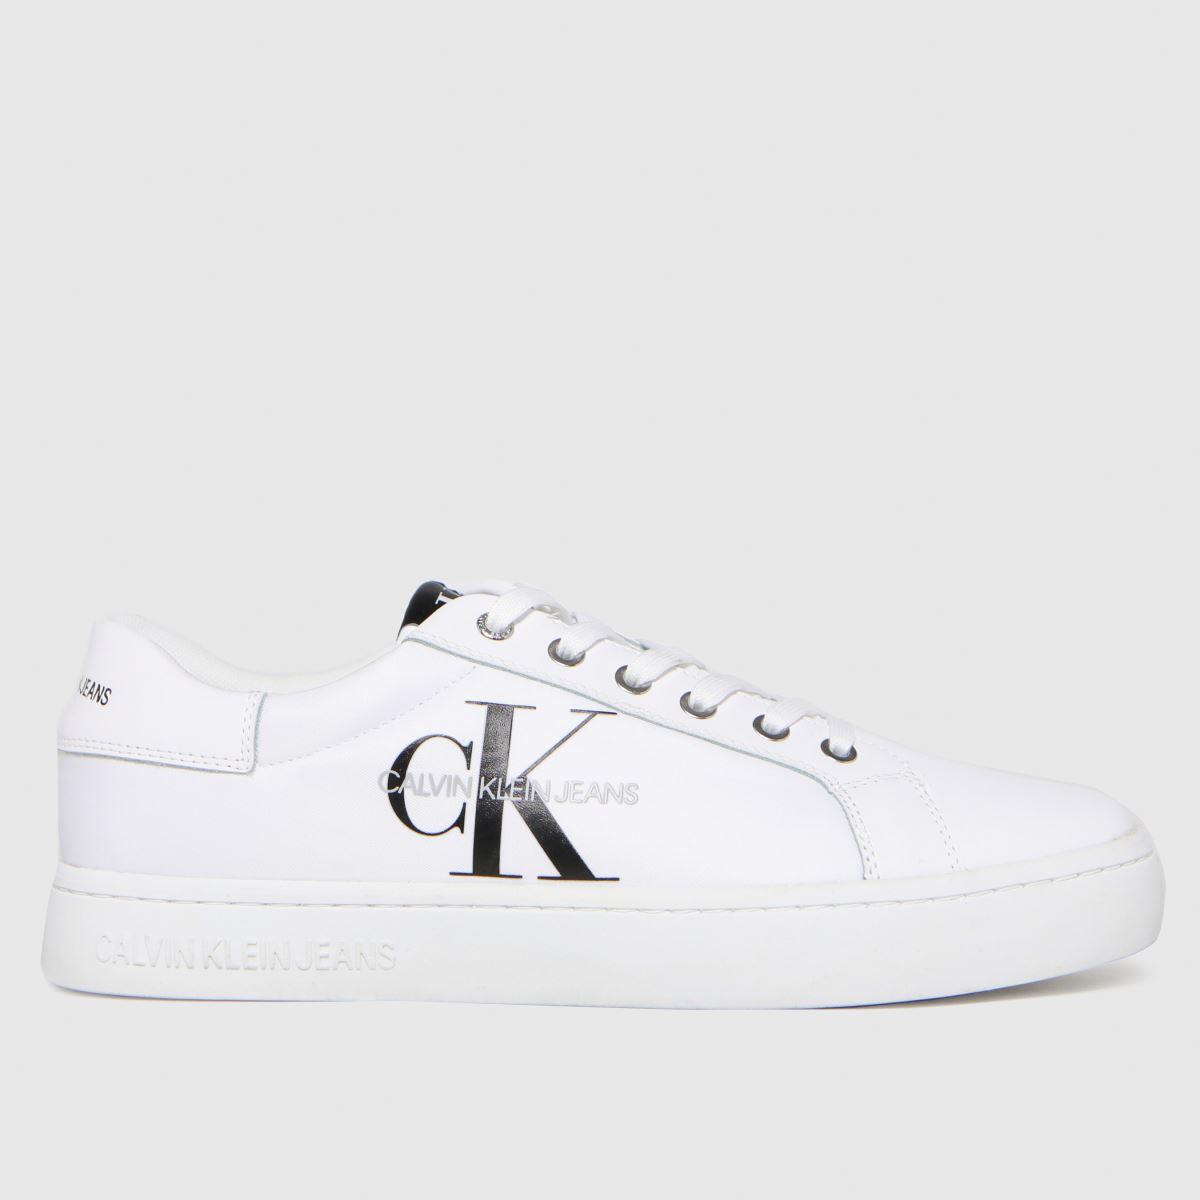 CALVIN KLEIN White Cupsole Sneaker Trainers